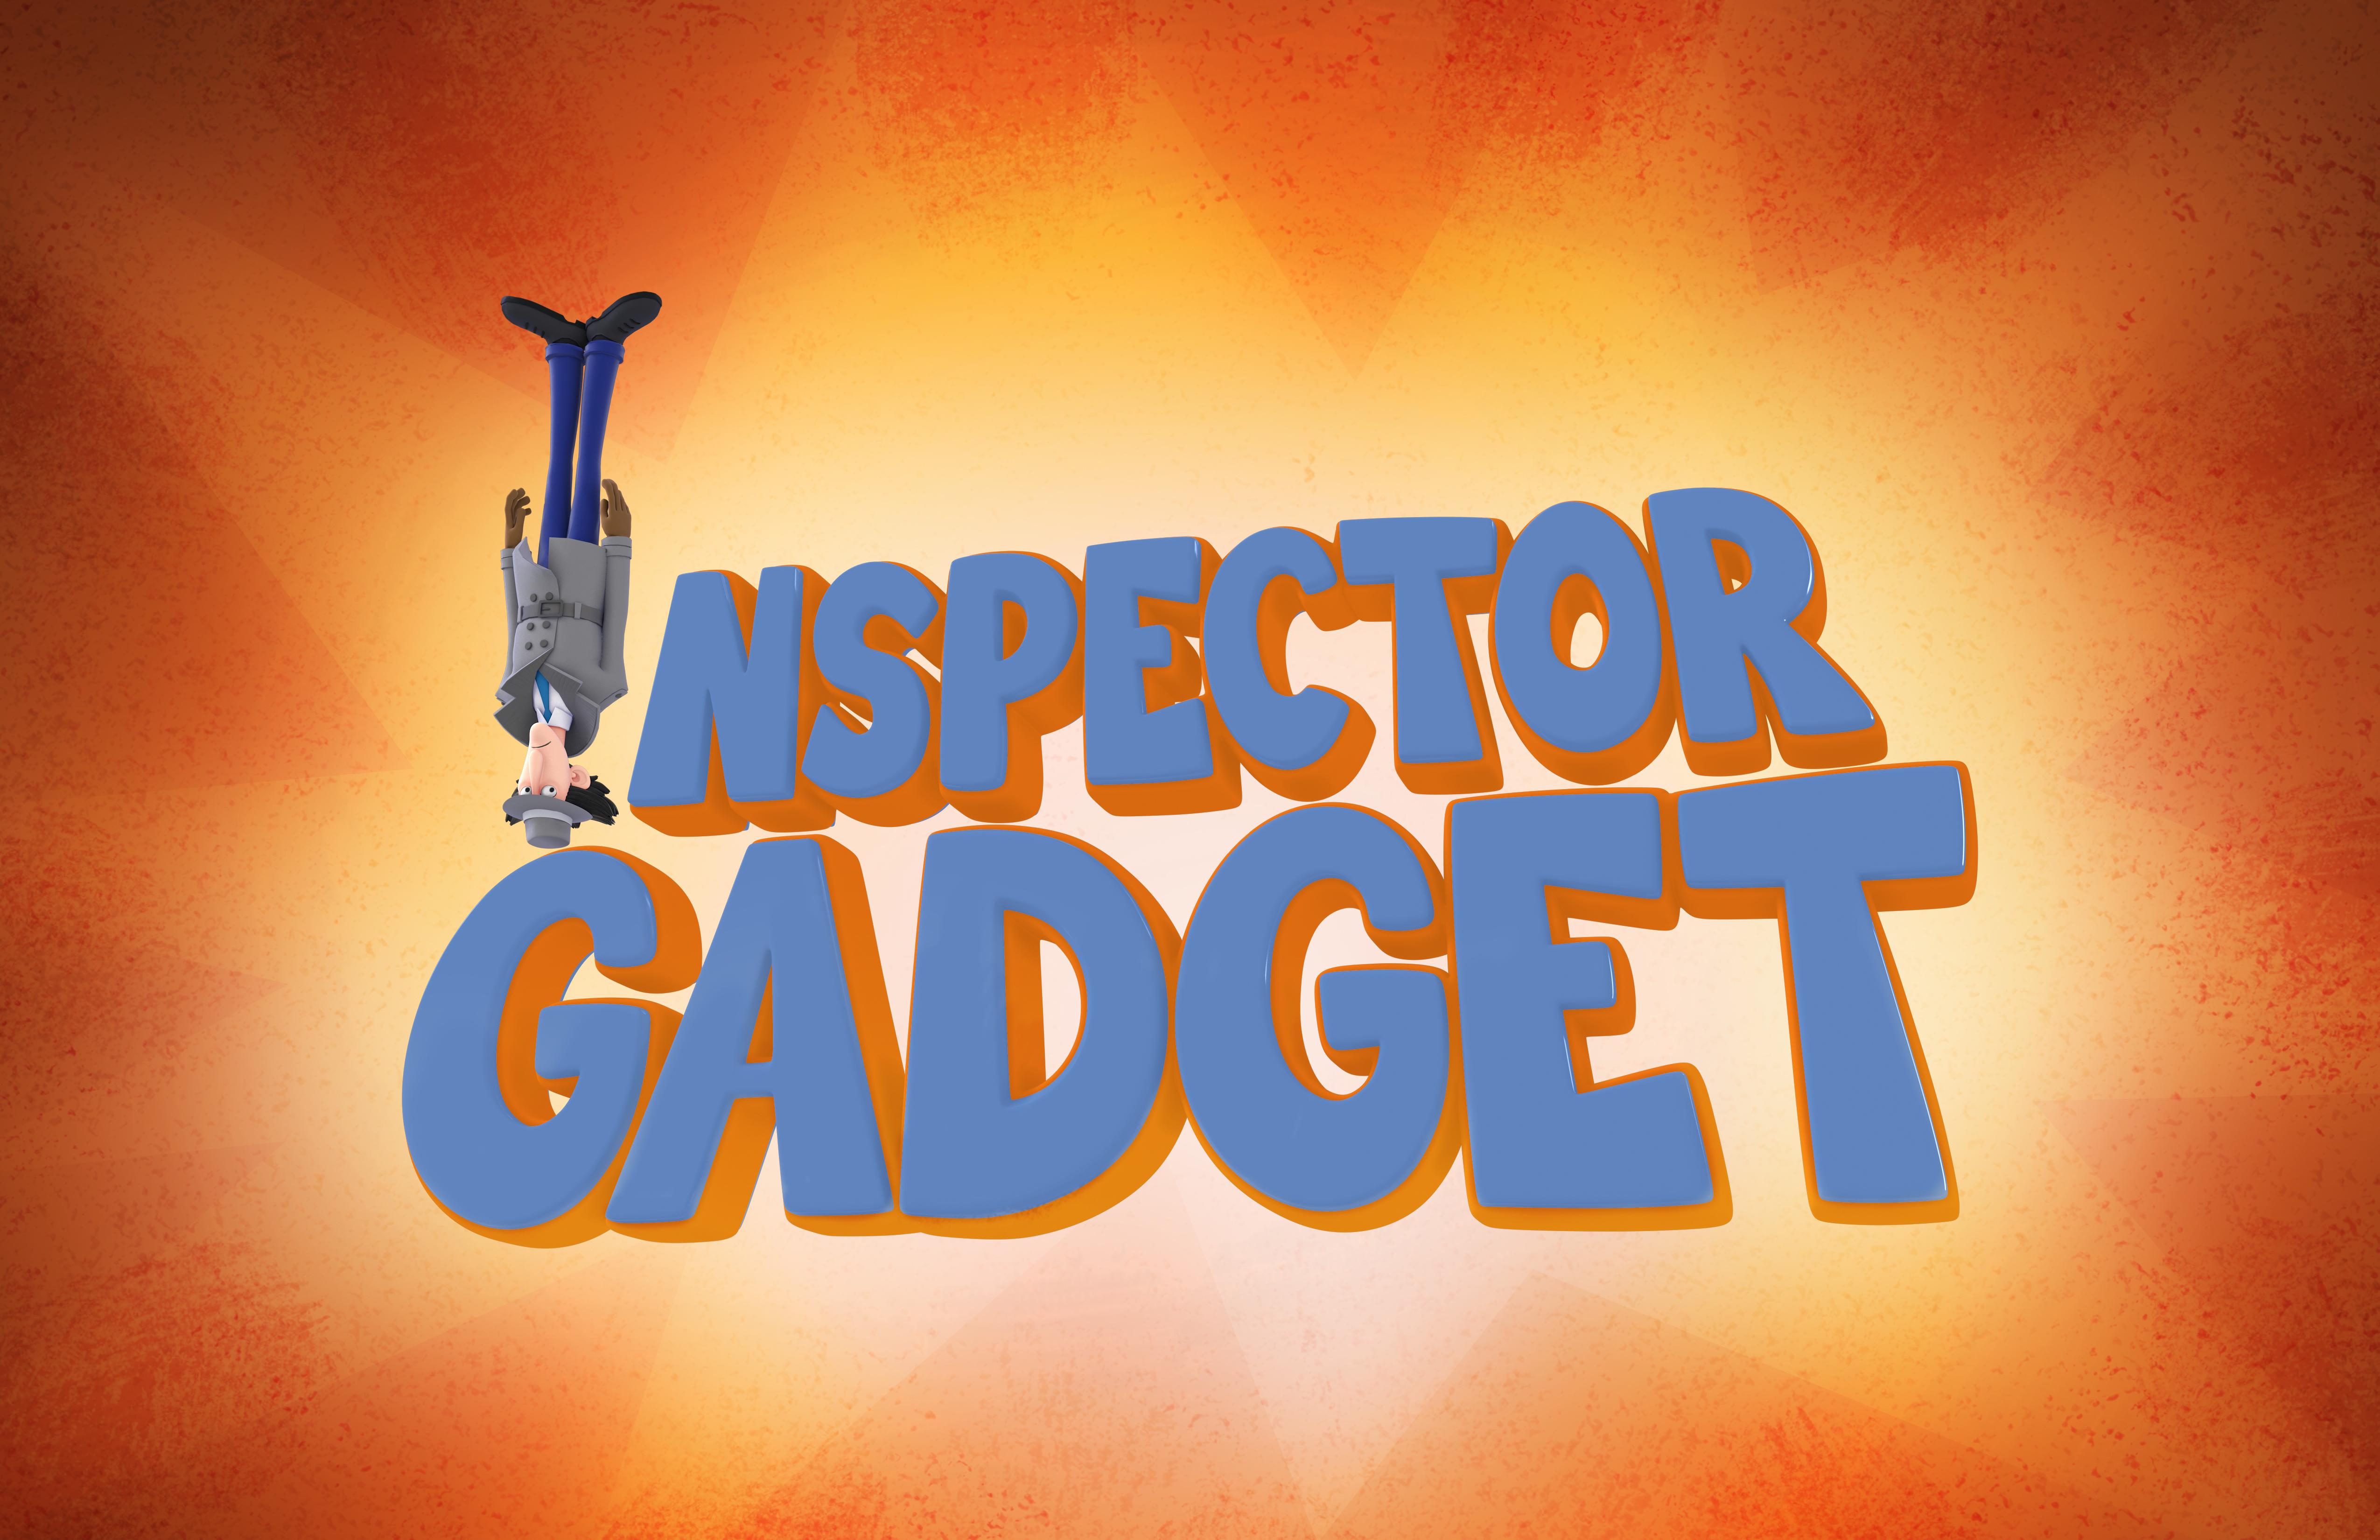 img_gadget_title_logo_3d_v01_2014-prsrm.jpg